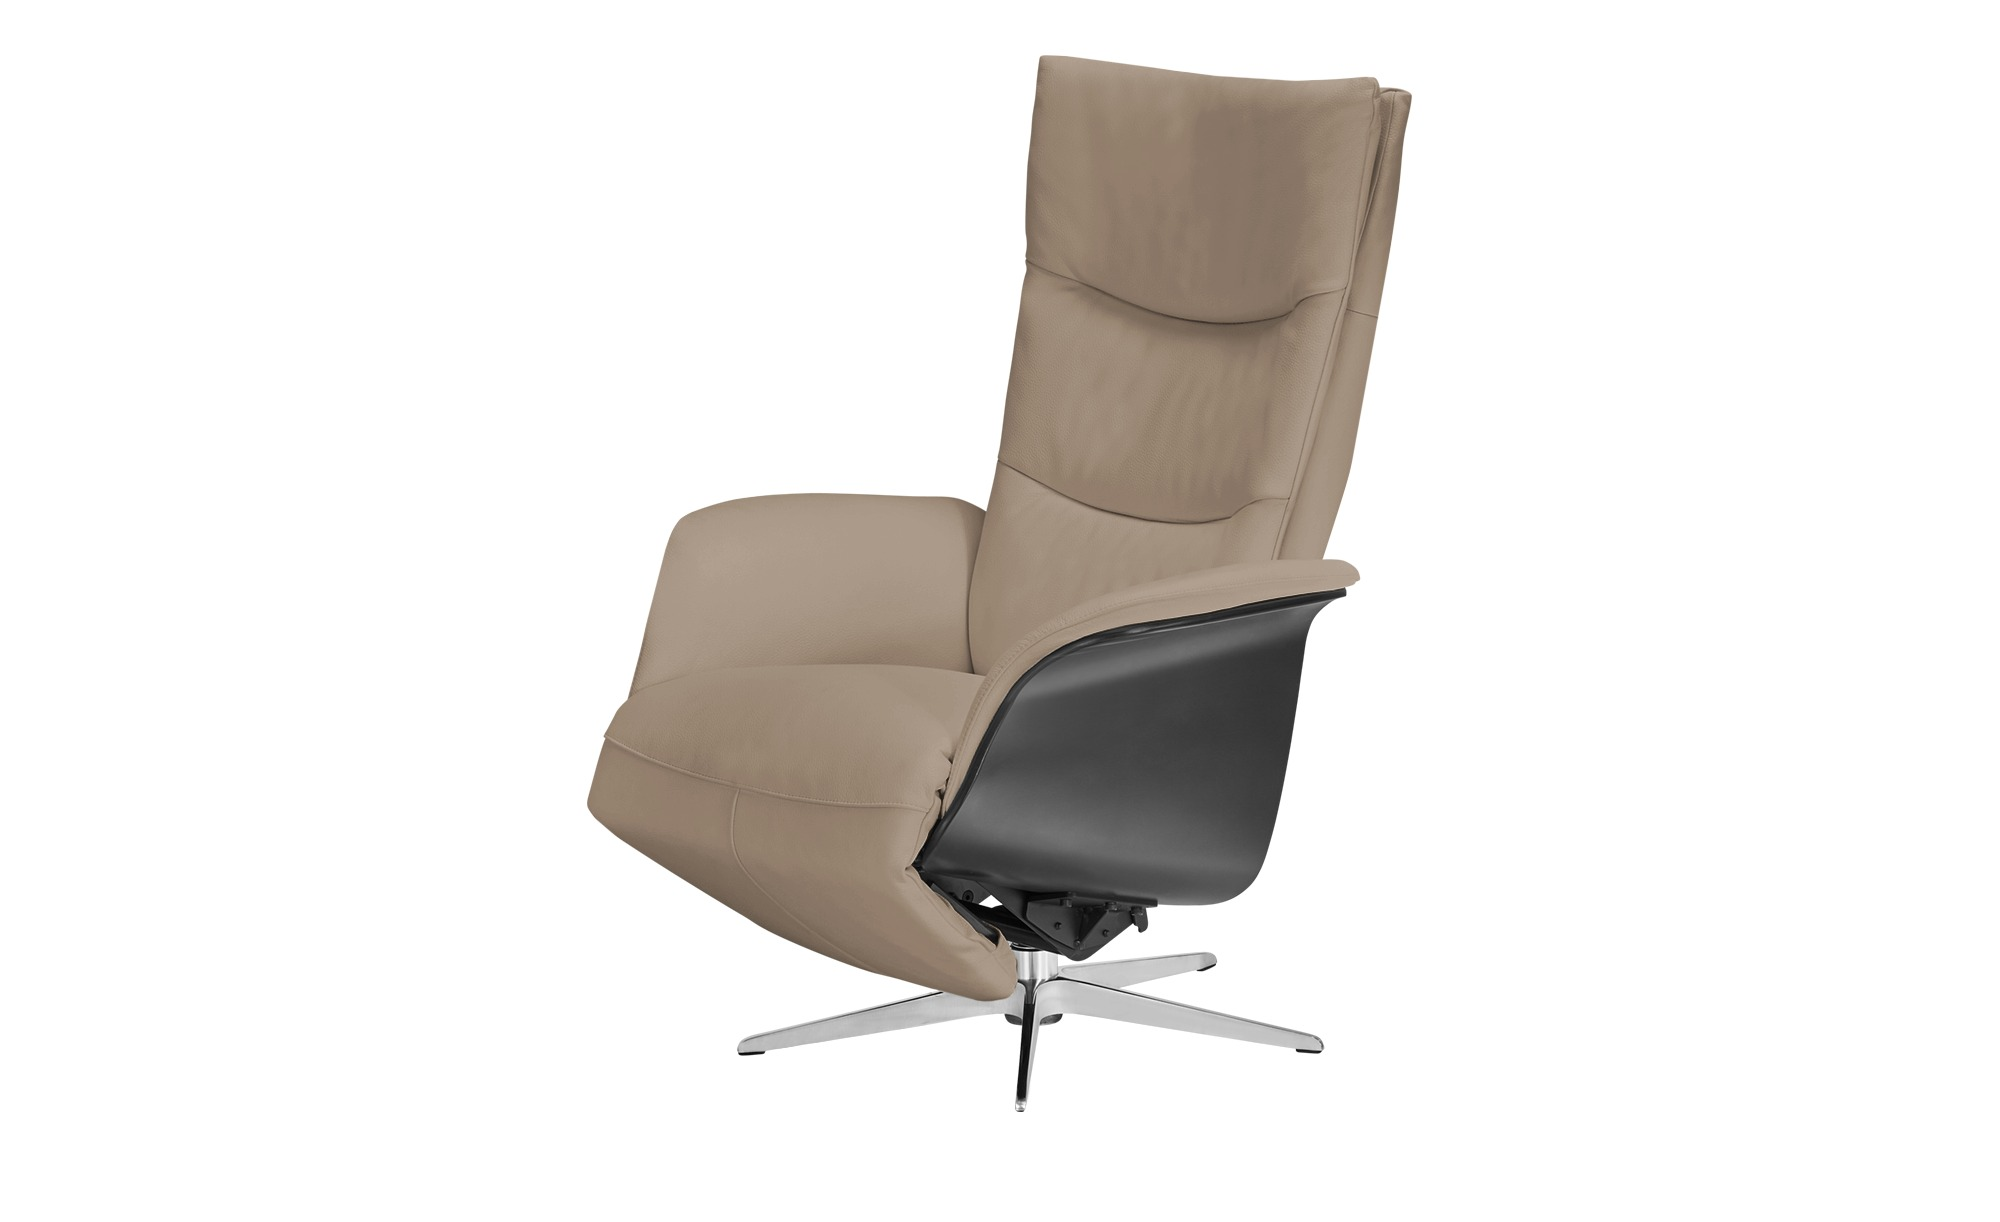 Nils Olsen Relaxsessel beige - Leder Mika ¦ beige ¦ Maße (cm): B: 77 H: 109 T: 82 Polstermöbel > Sessel > Fernsehsessel - Höffner